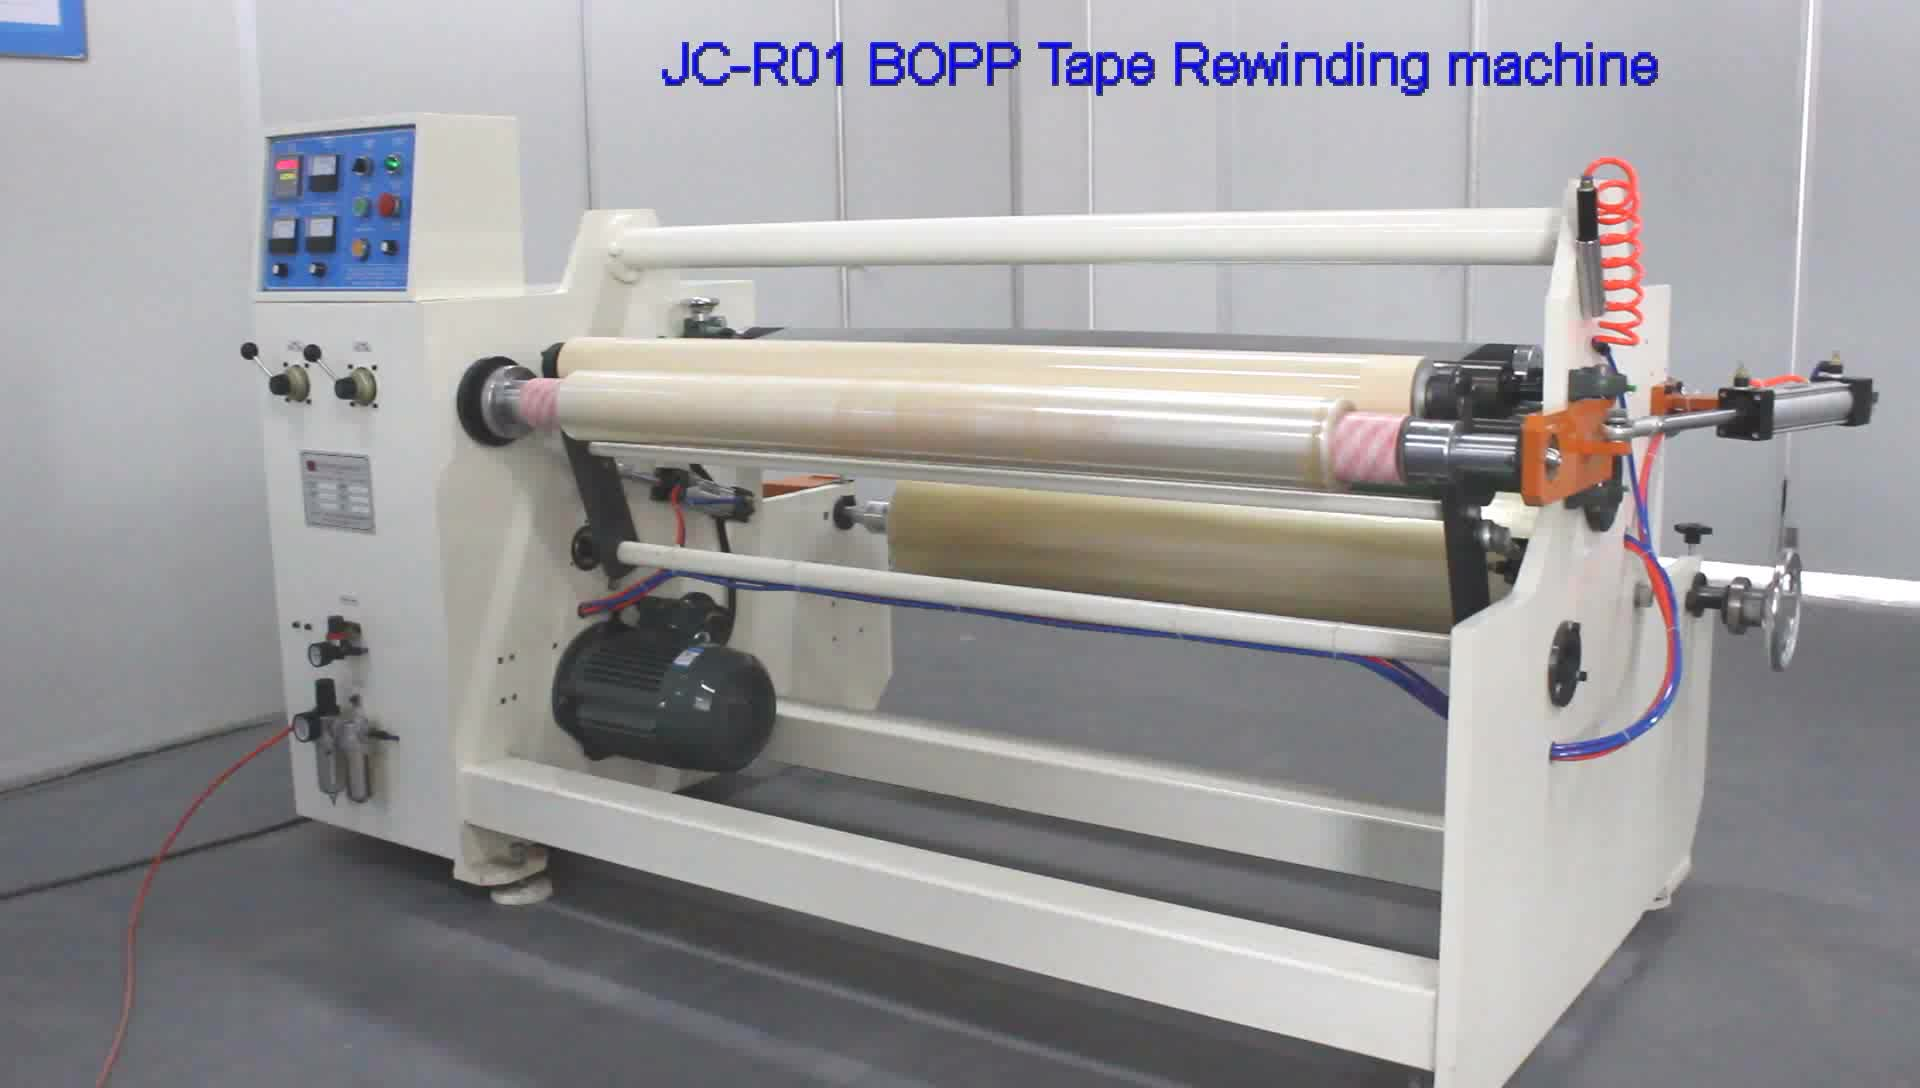 Single shaft jumbo roll rewinding machine for masking tape bopp tape